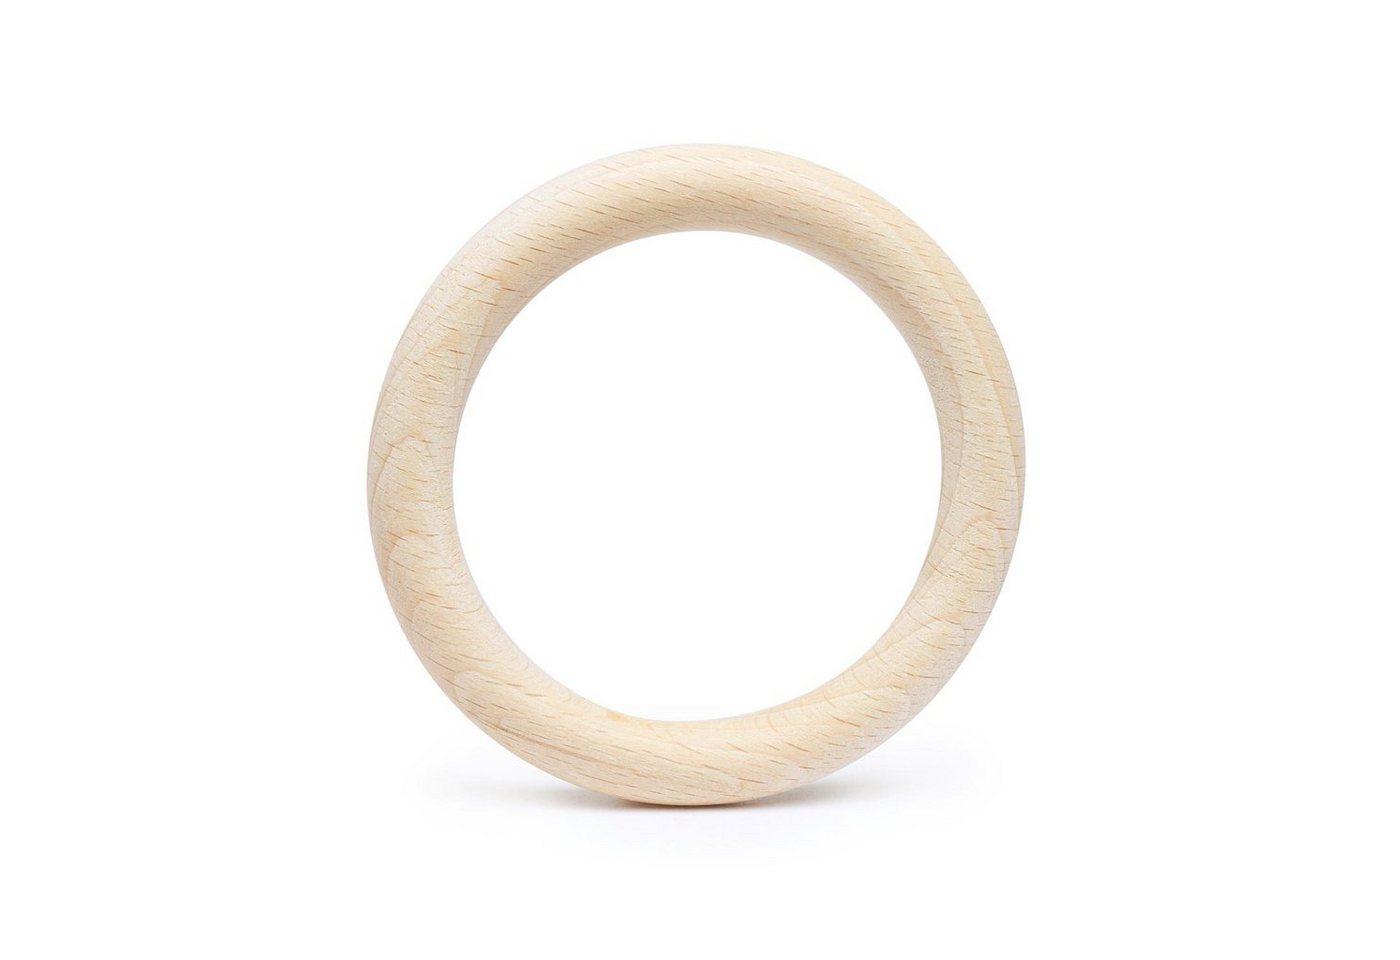 OTTO Holzring natur, Ø 10 cm